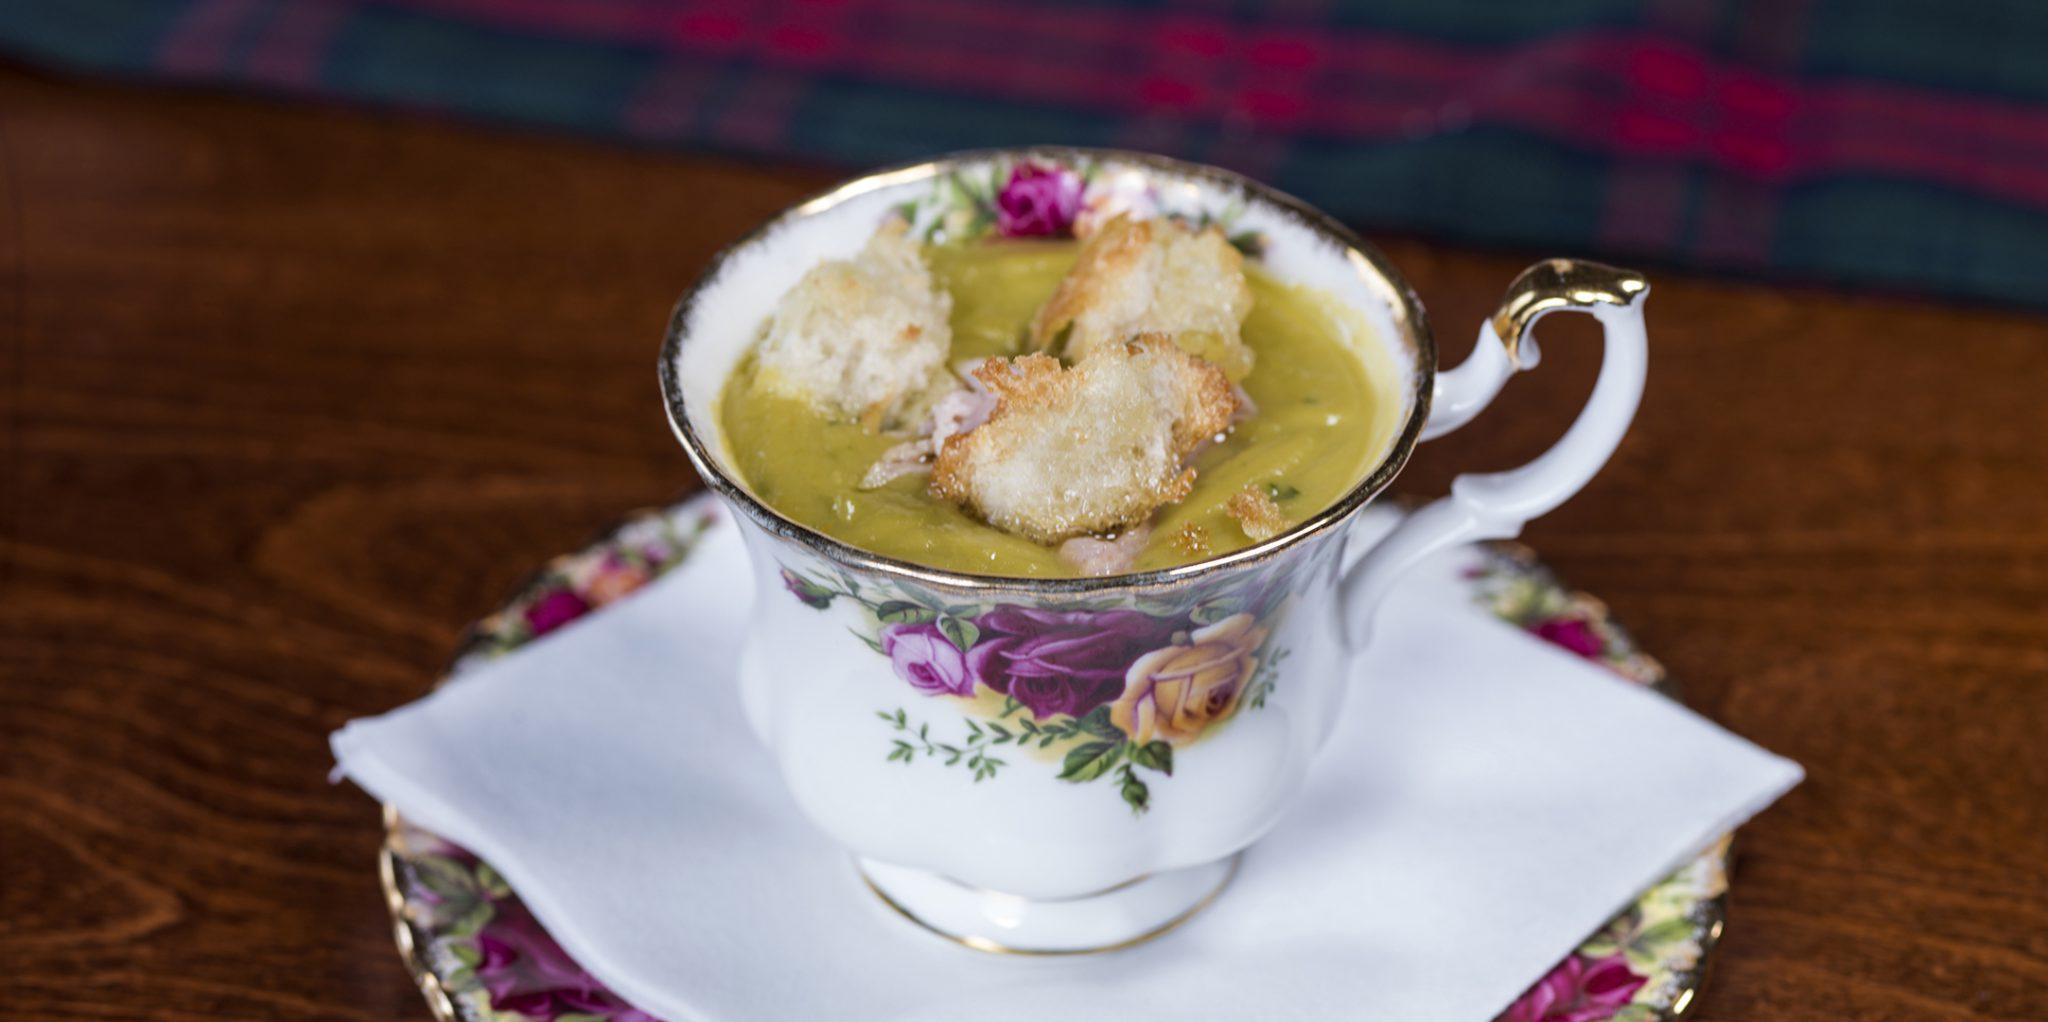 Menu – Soups